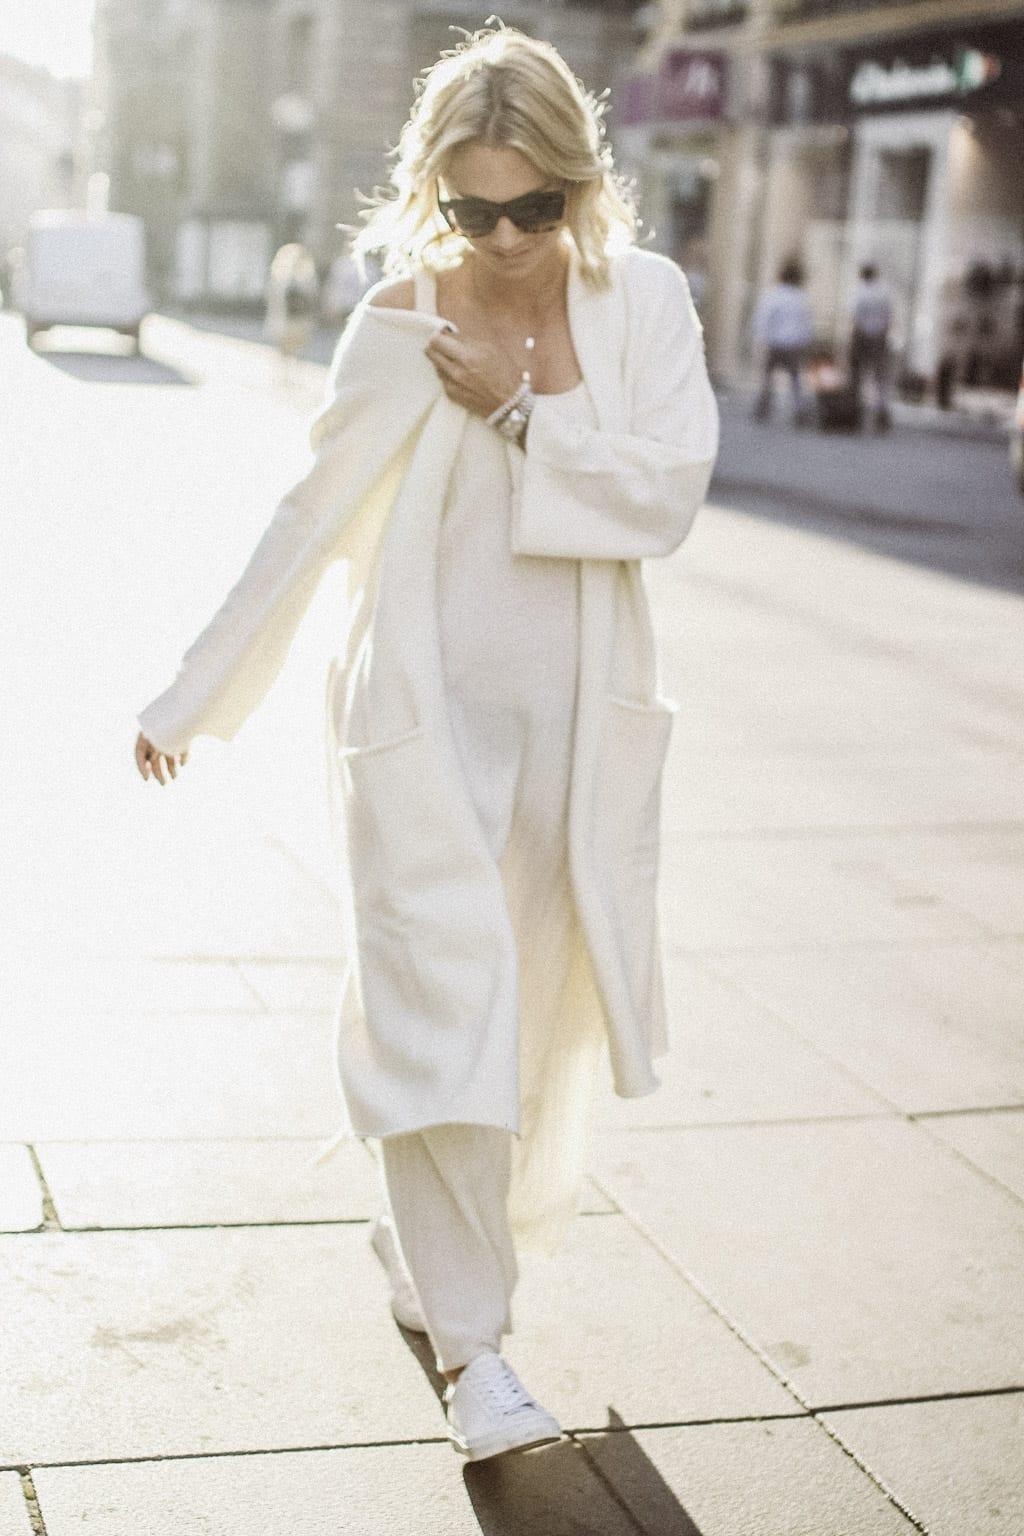 ck-constantlyk-com-karin-kaswurm-cashmere-outfit-zara-8951